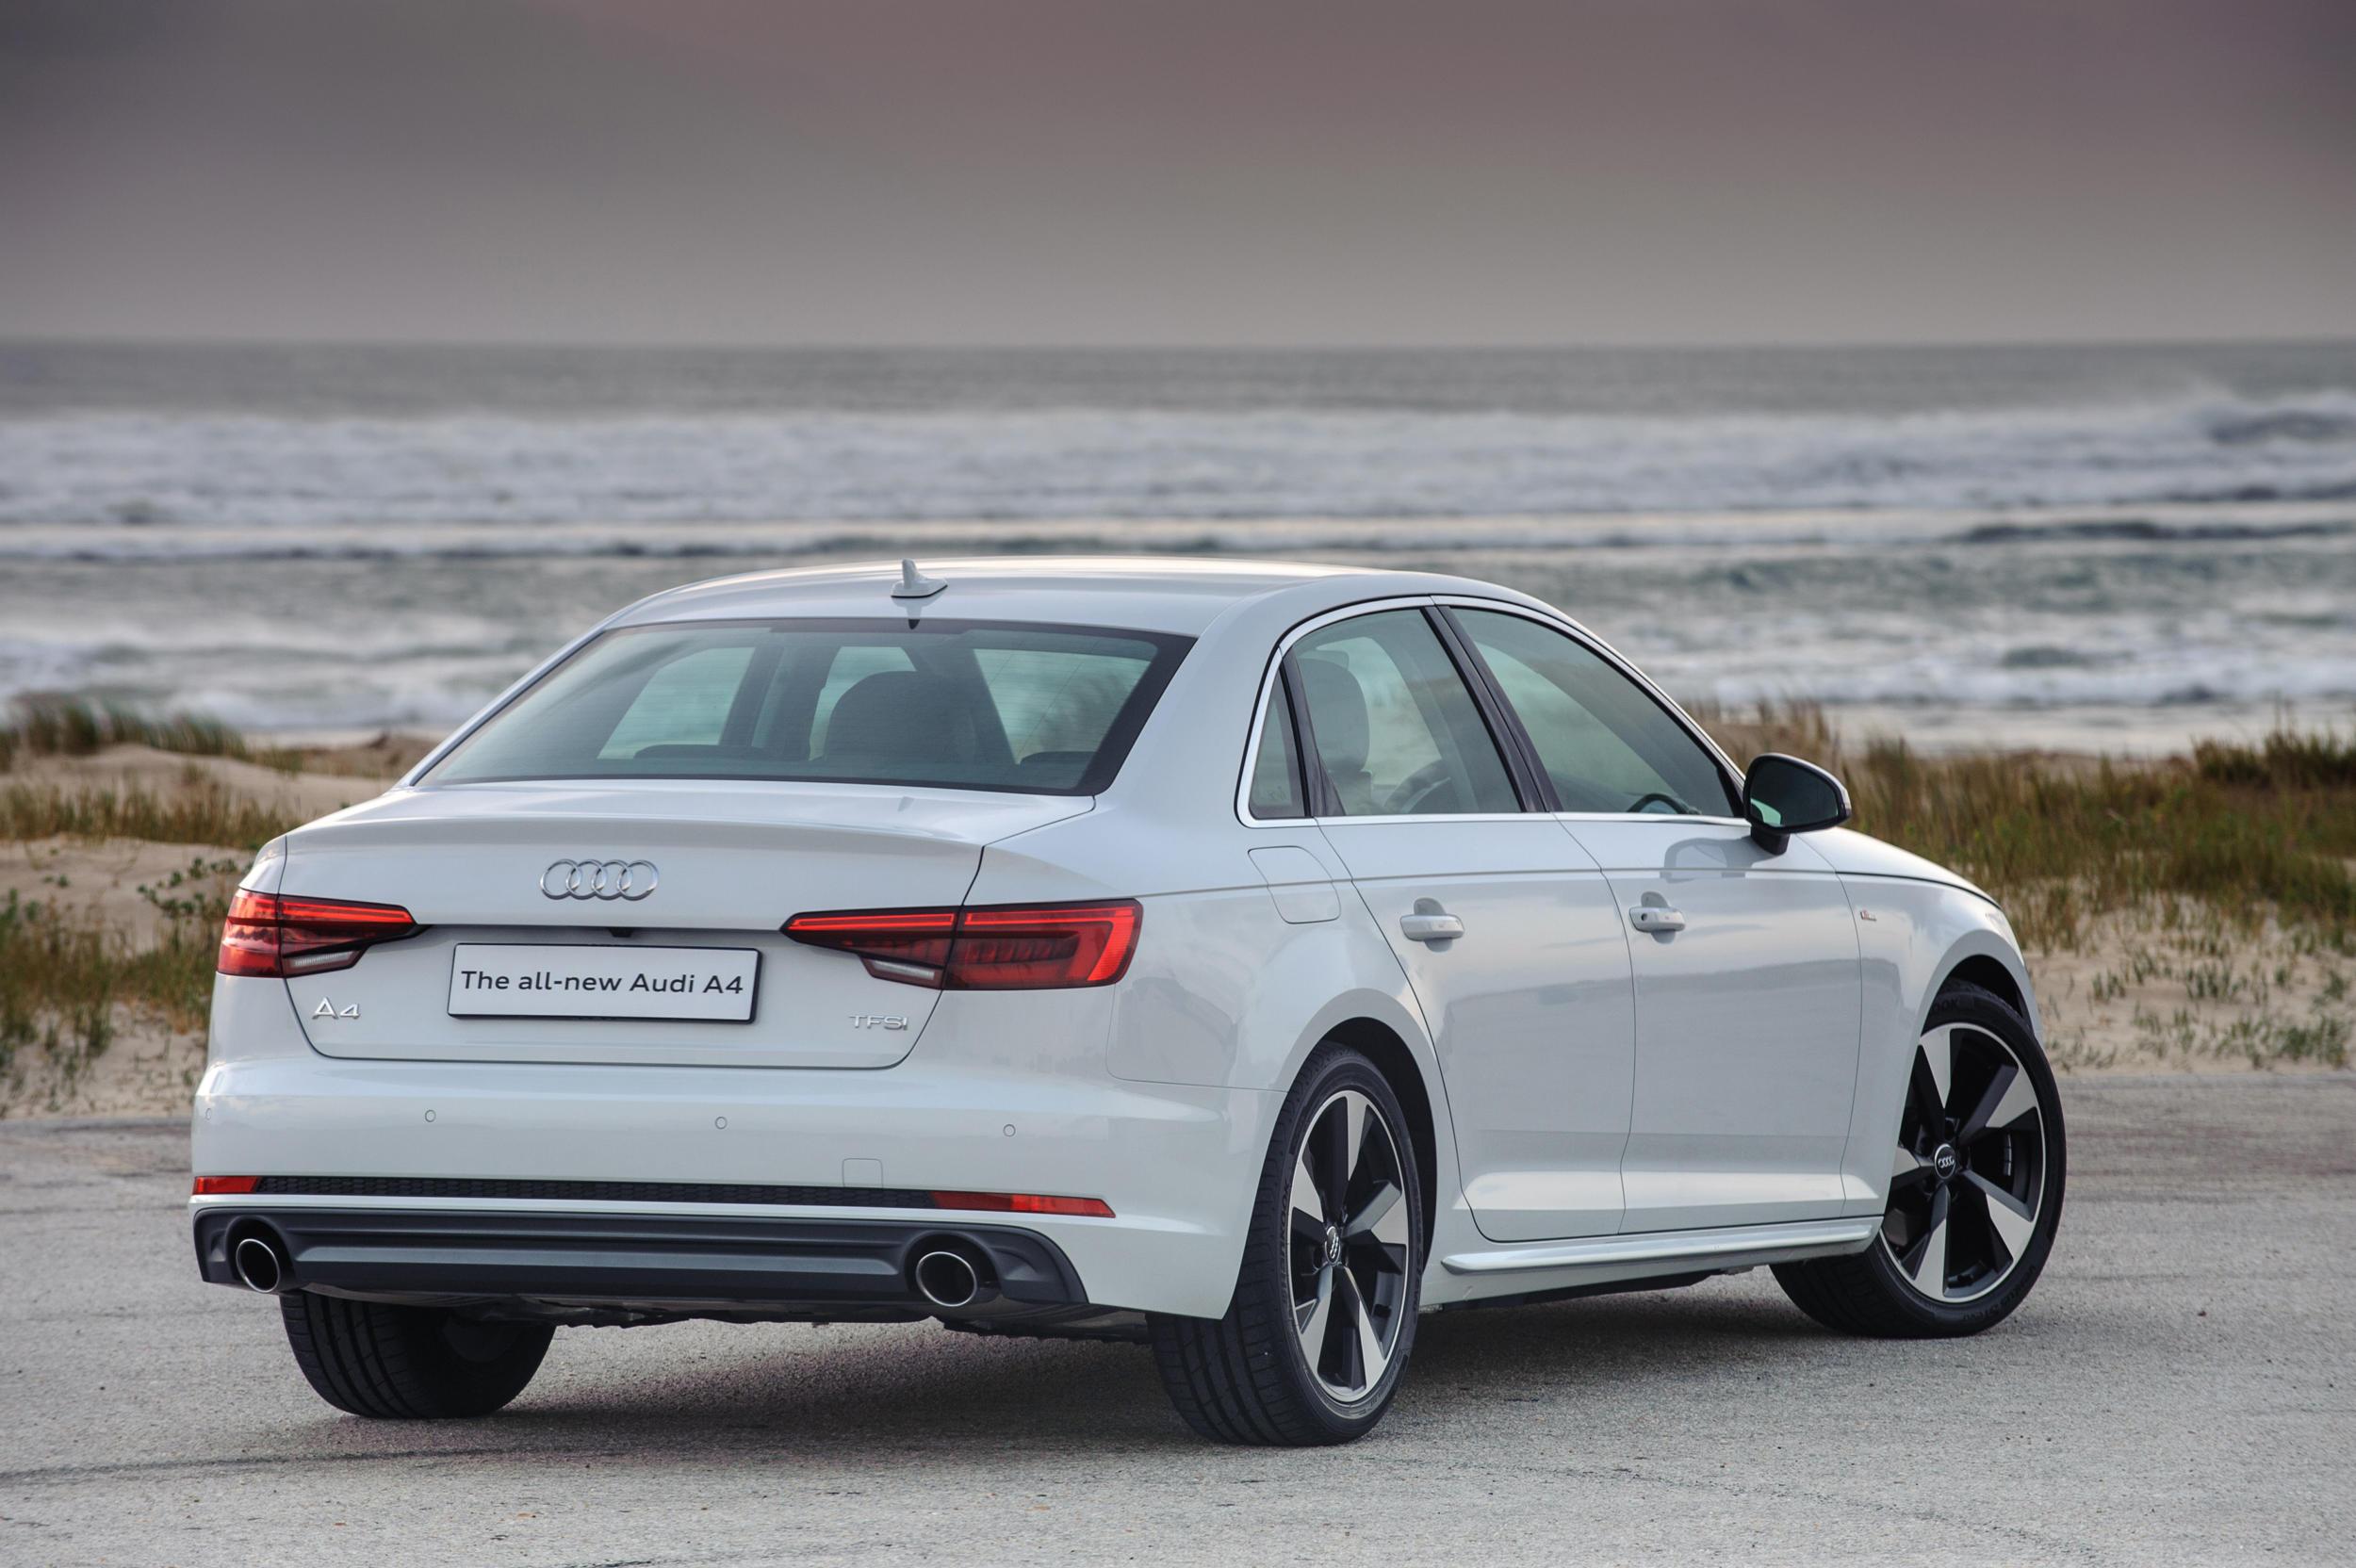 12_Audi A4_72dpi